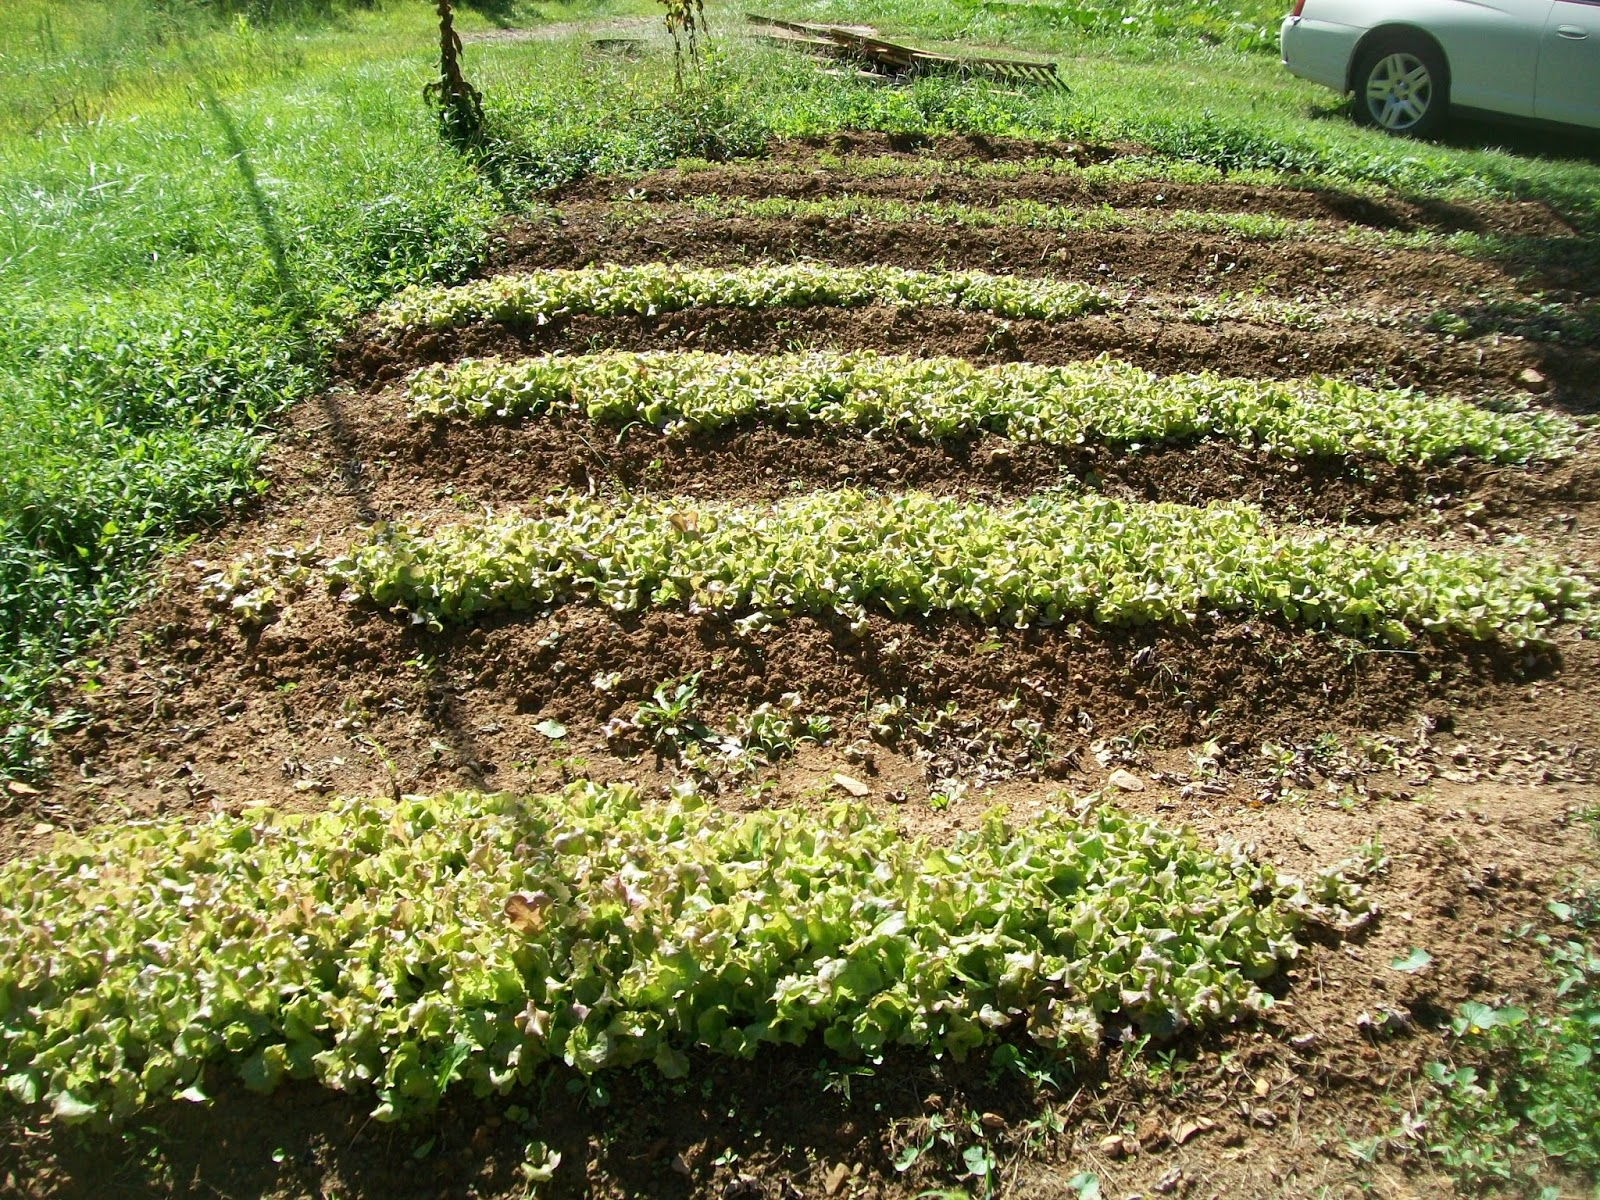 Vegetable garden rows - How To Garden For Free Comprehensive List Of My Top 20 Gardening Tips